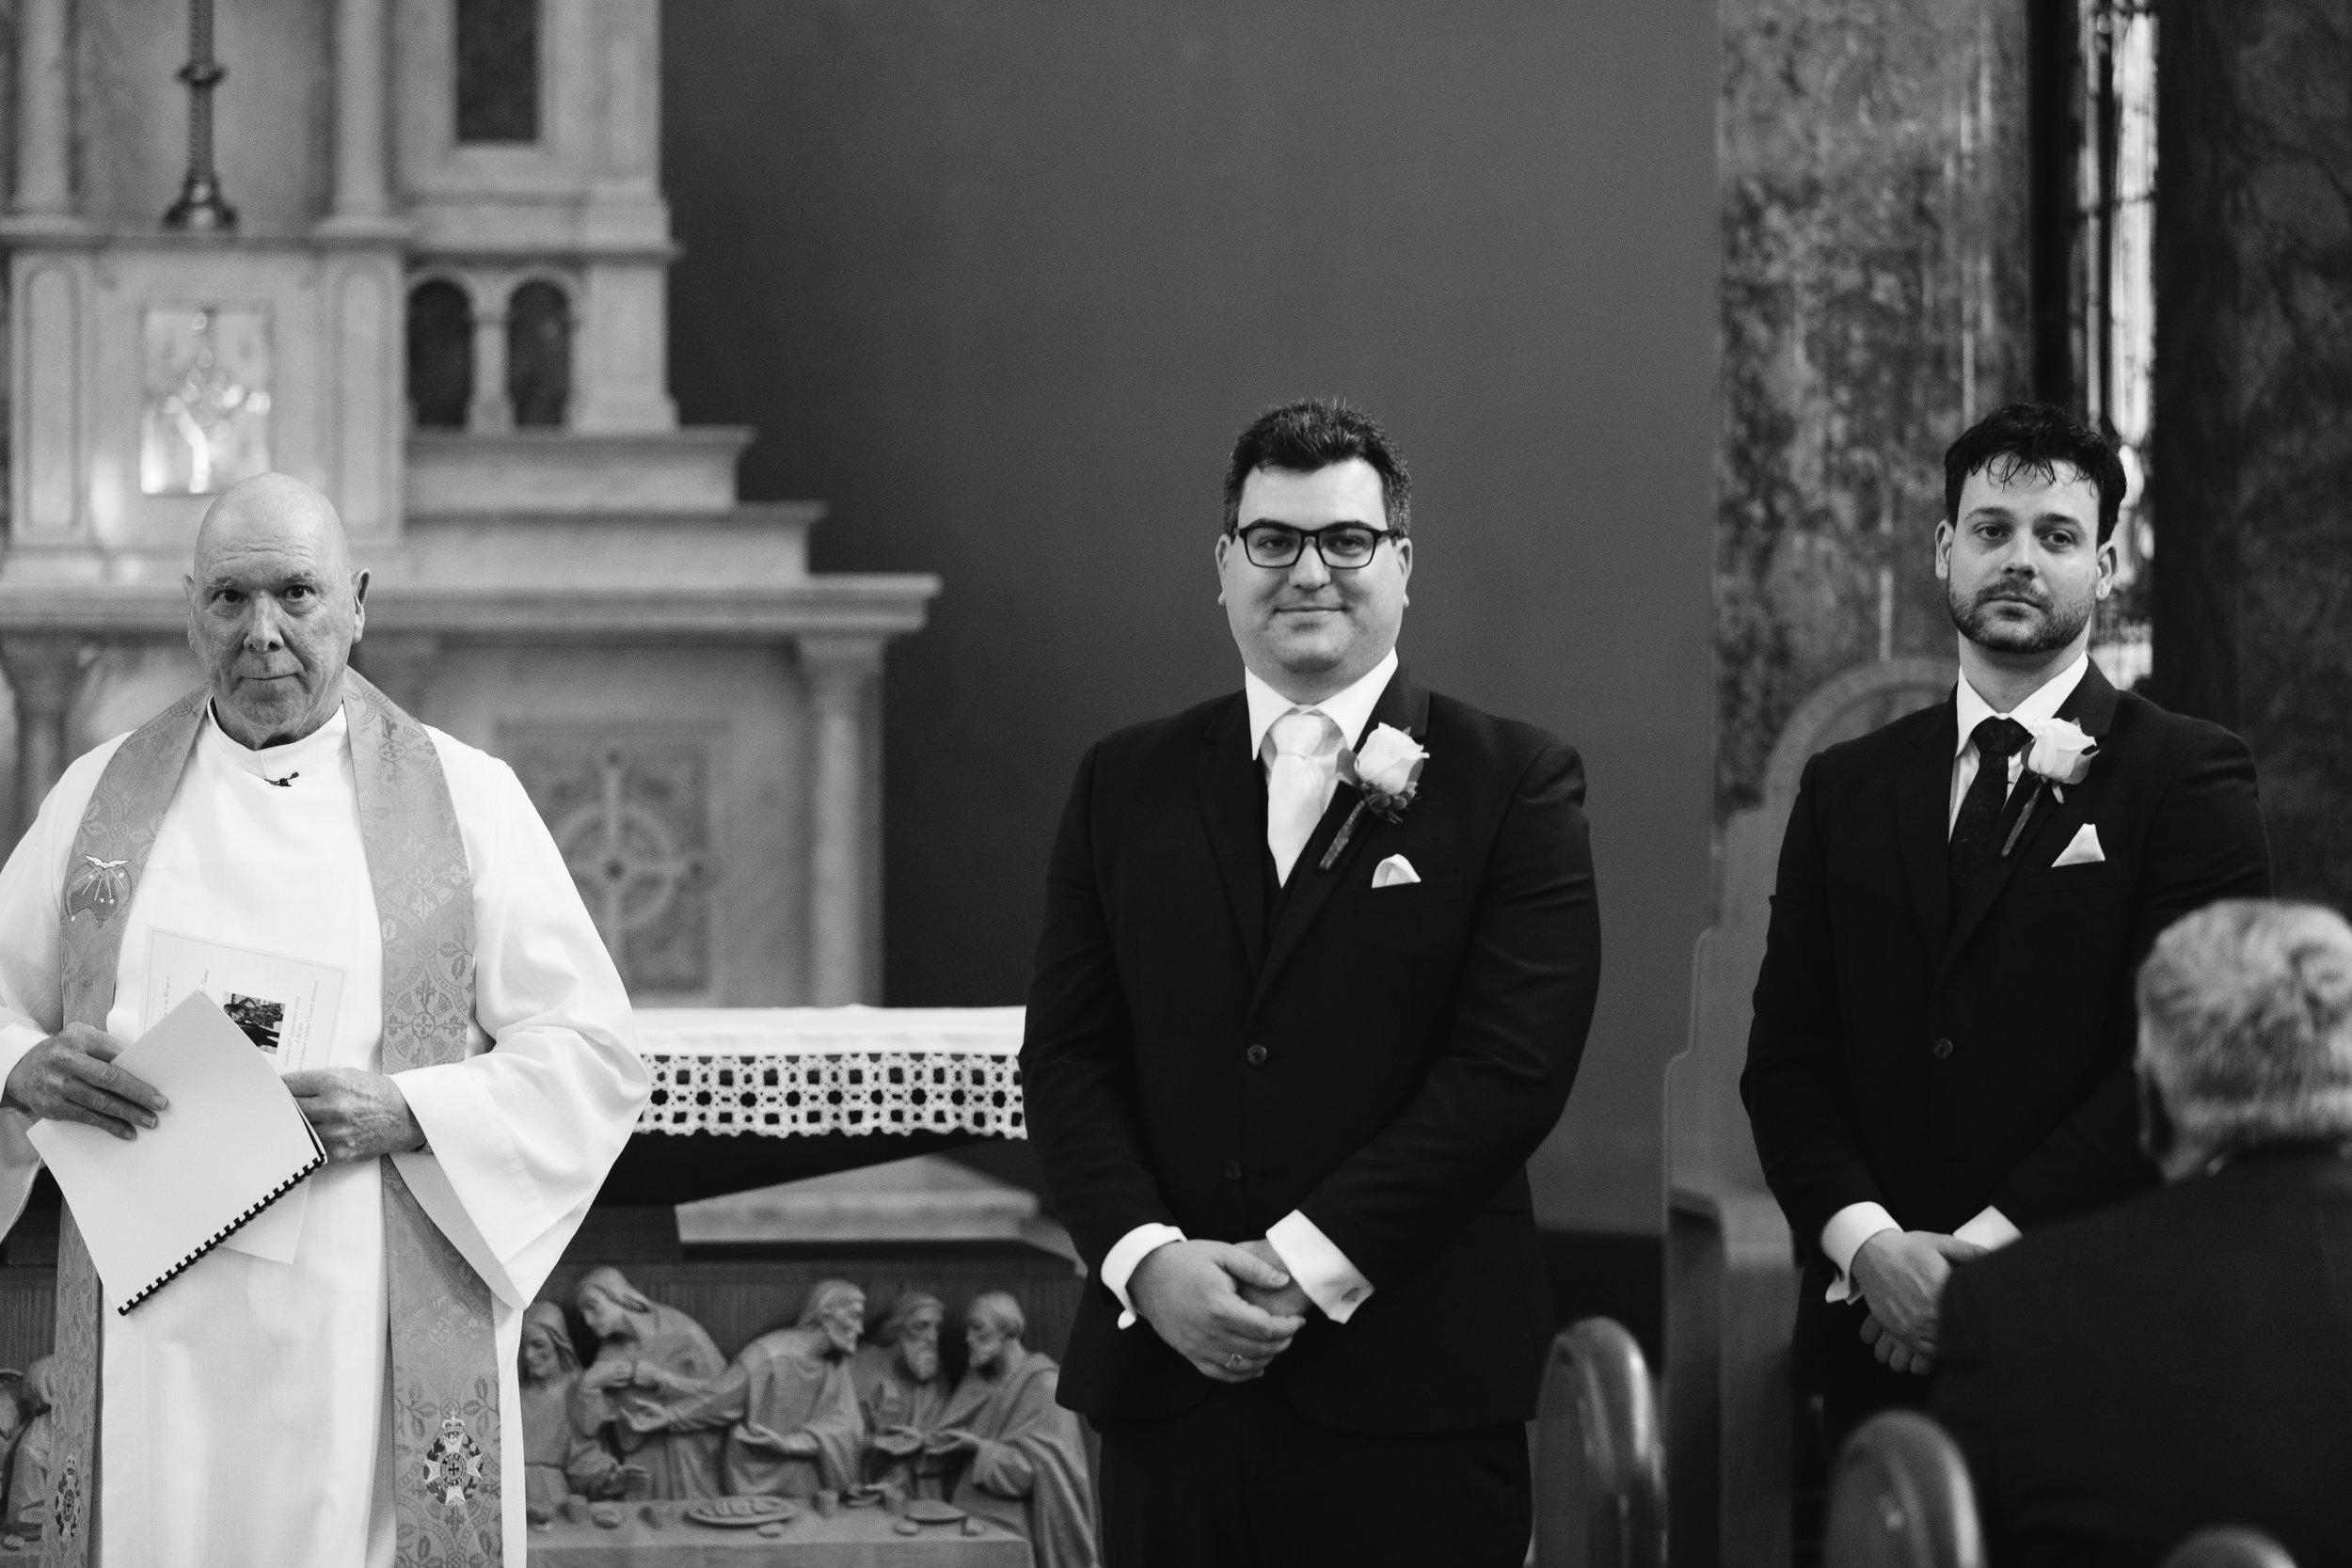 brisbane-wedding-photographer-48.jpg